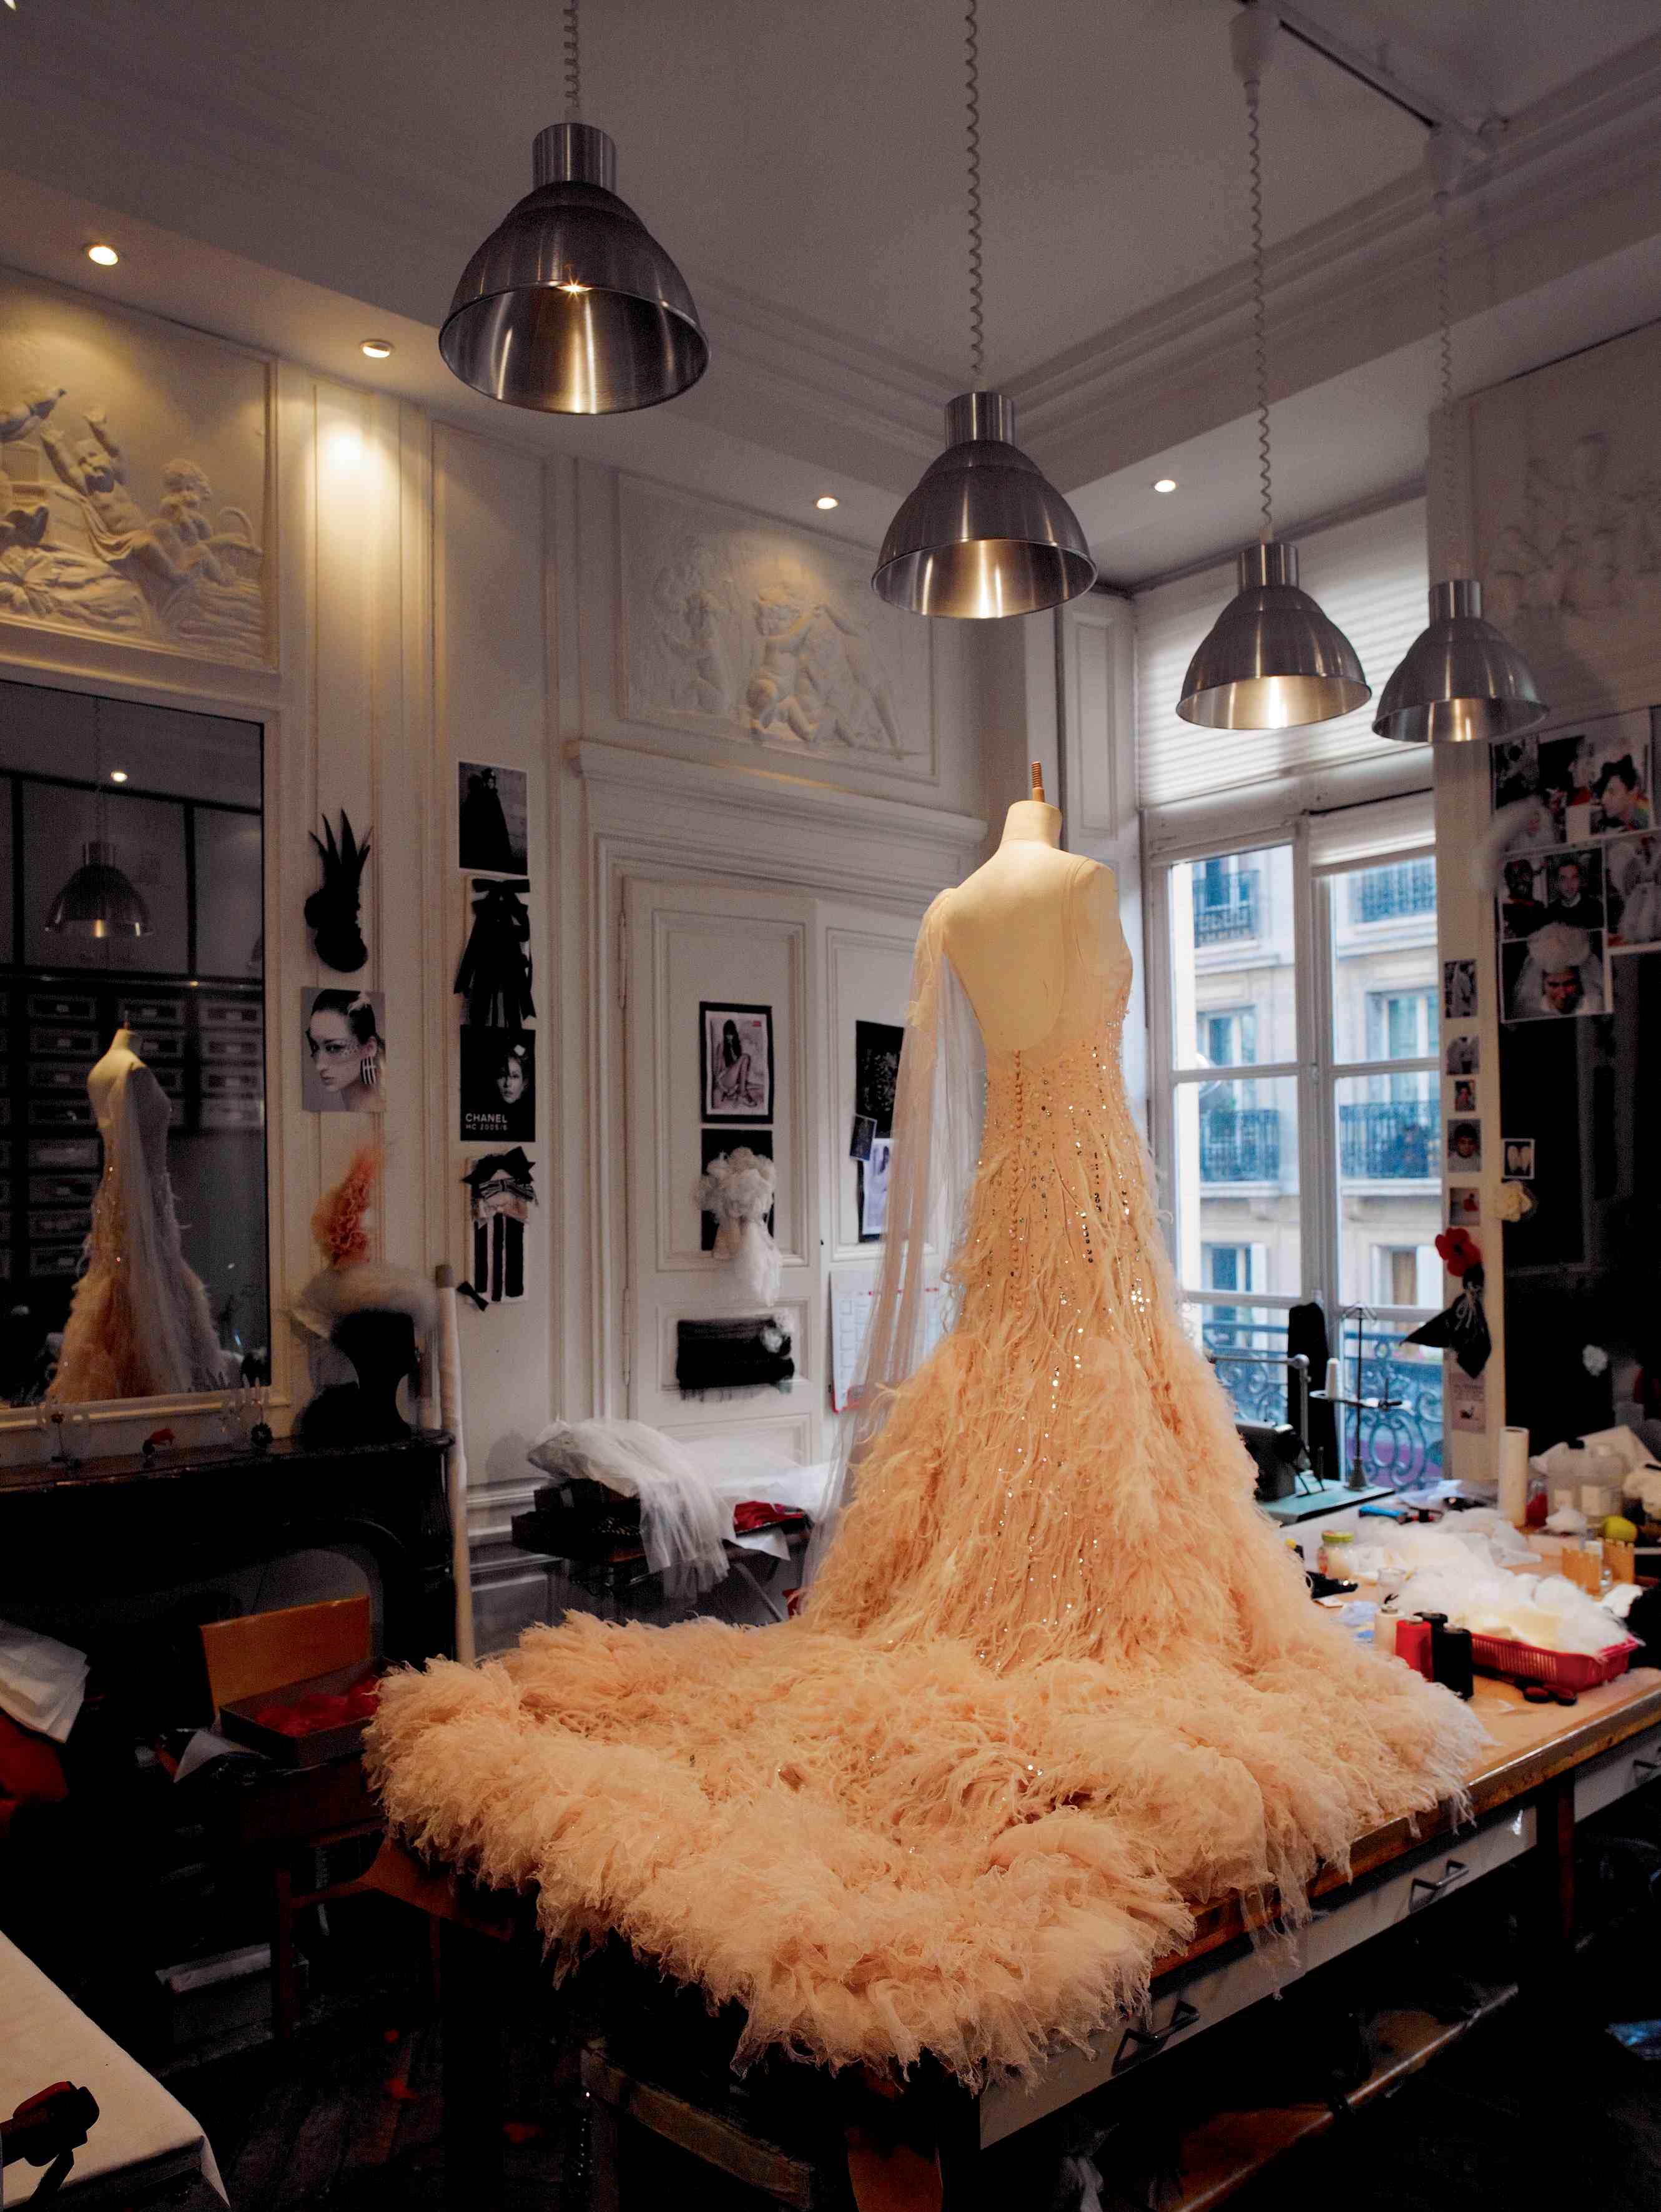 Maison lemari glimpse creations - Maison style atelier ...